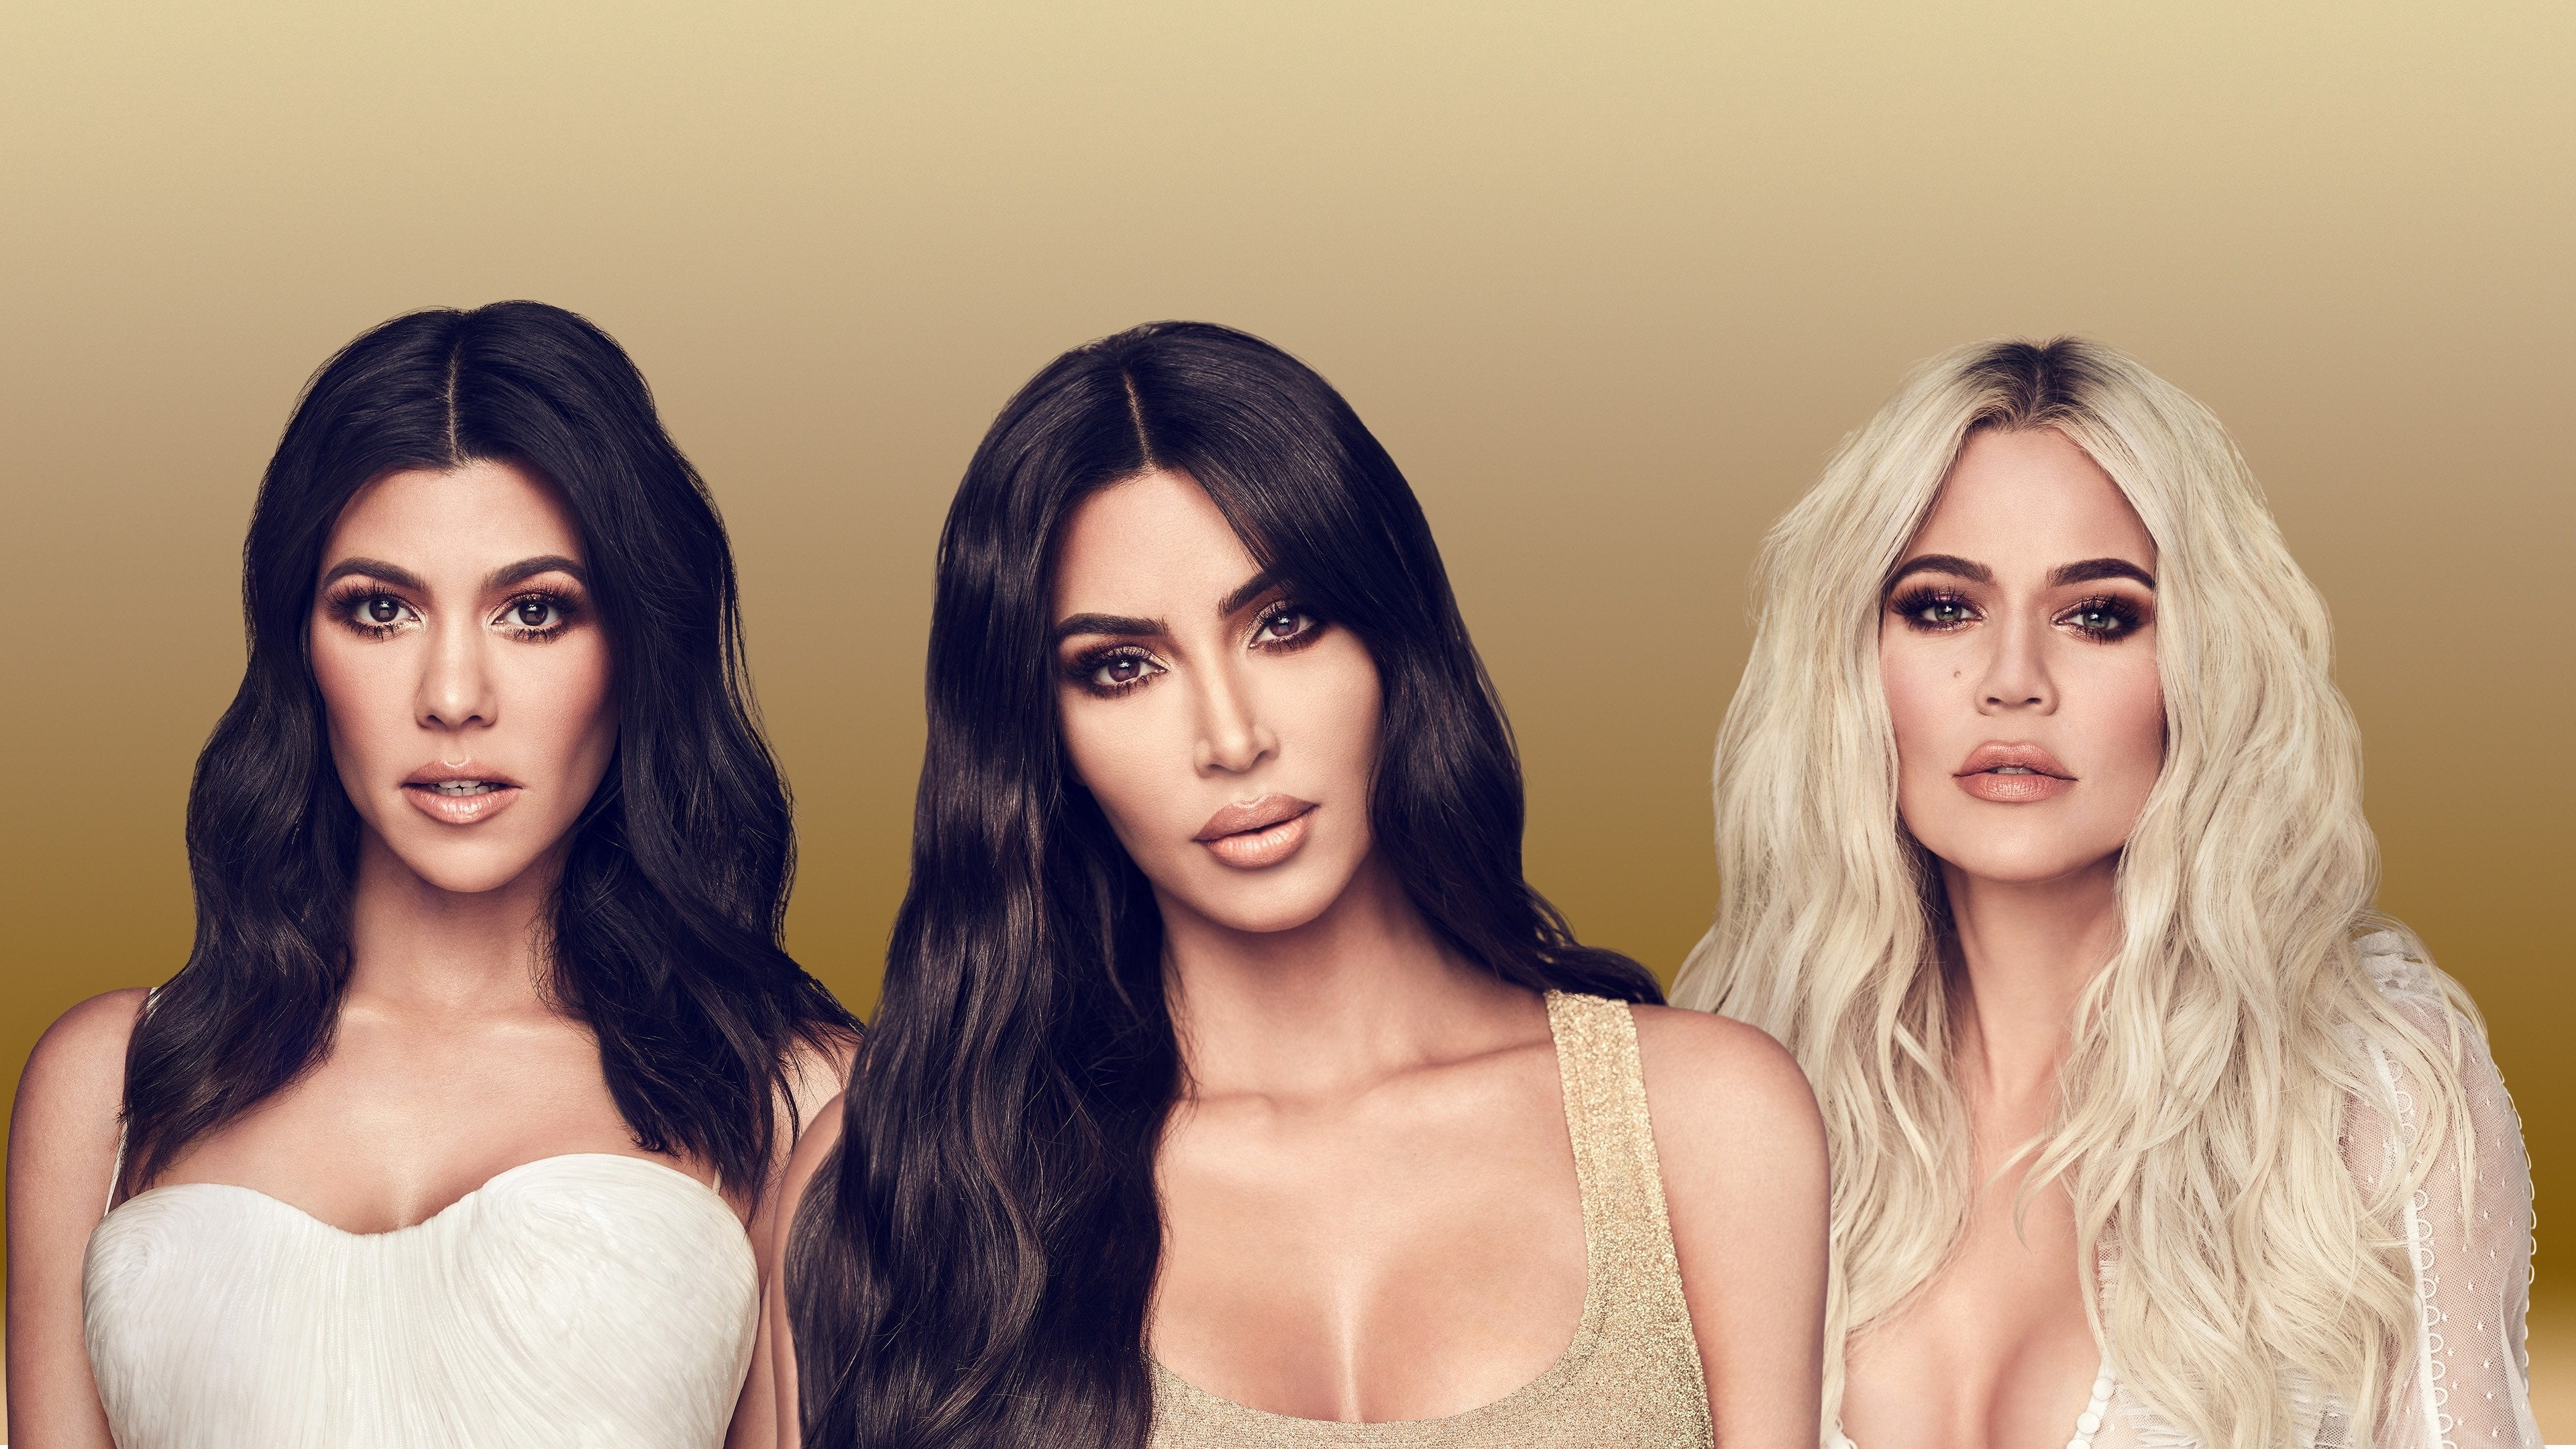 Fondos de pantalla Keeping up with the Kardashians Temporada 20